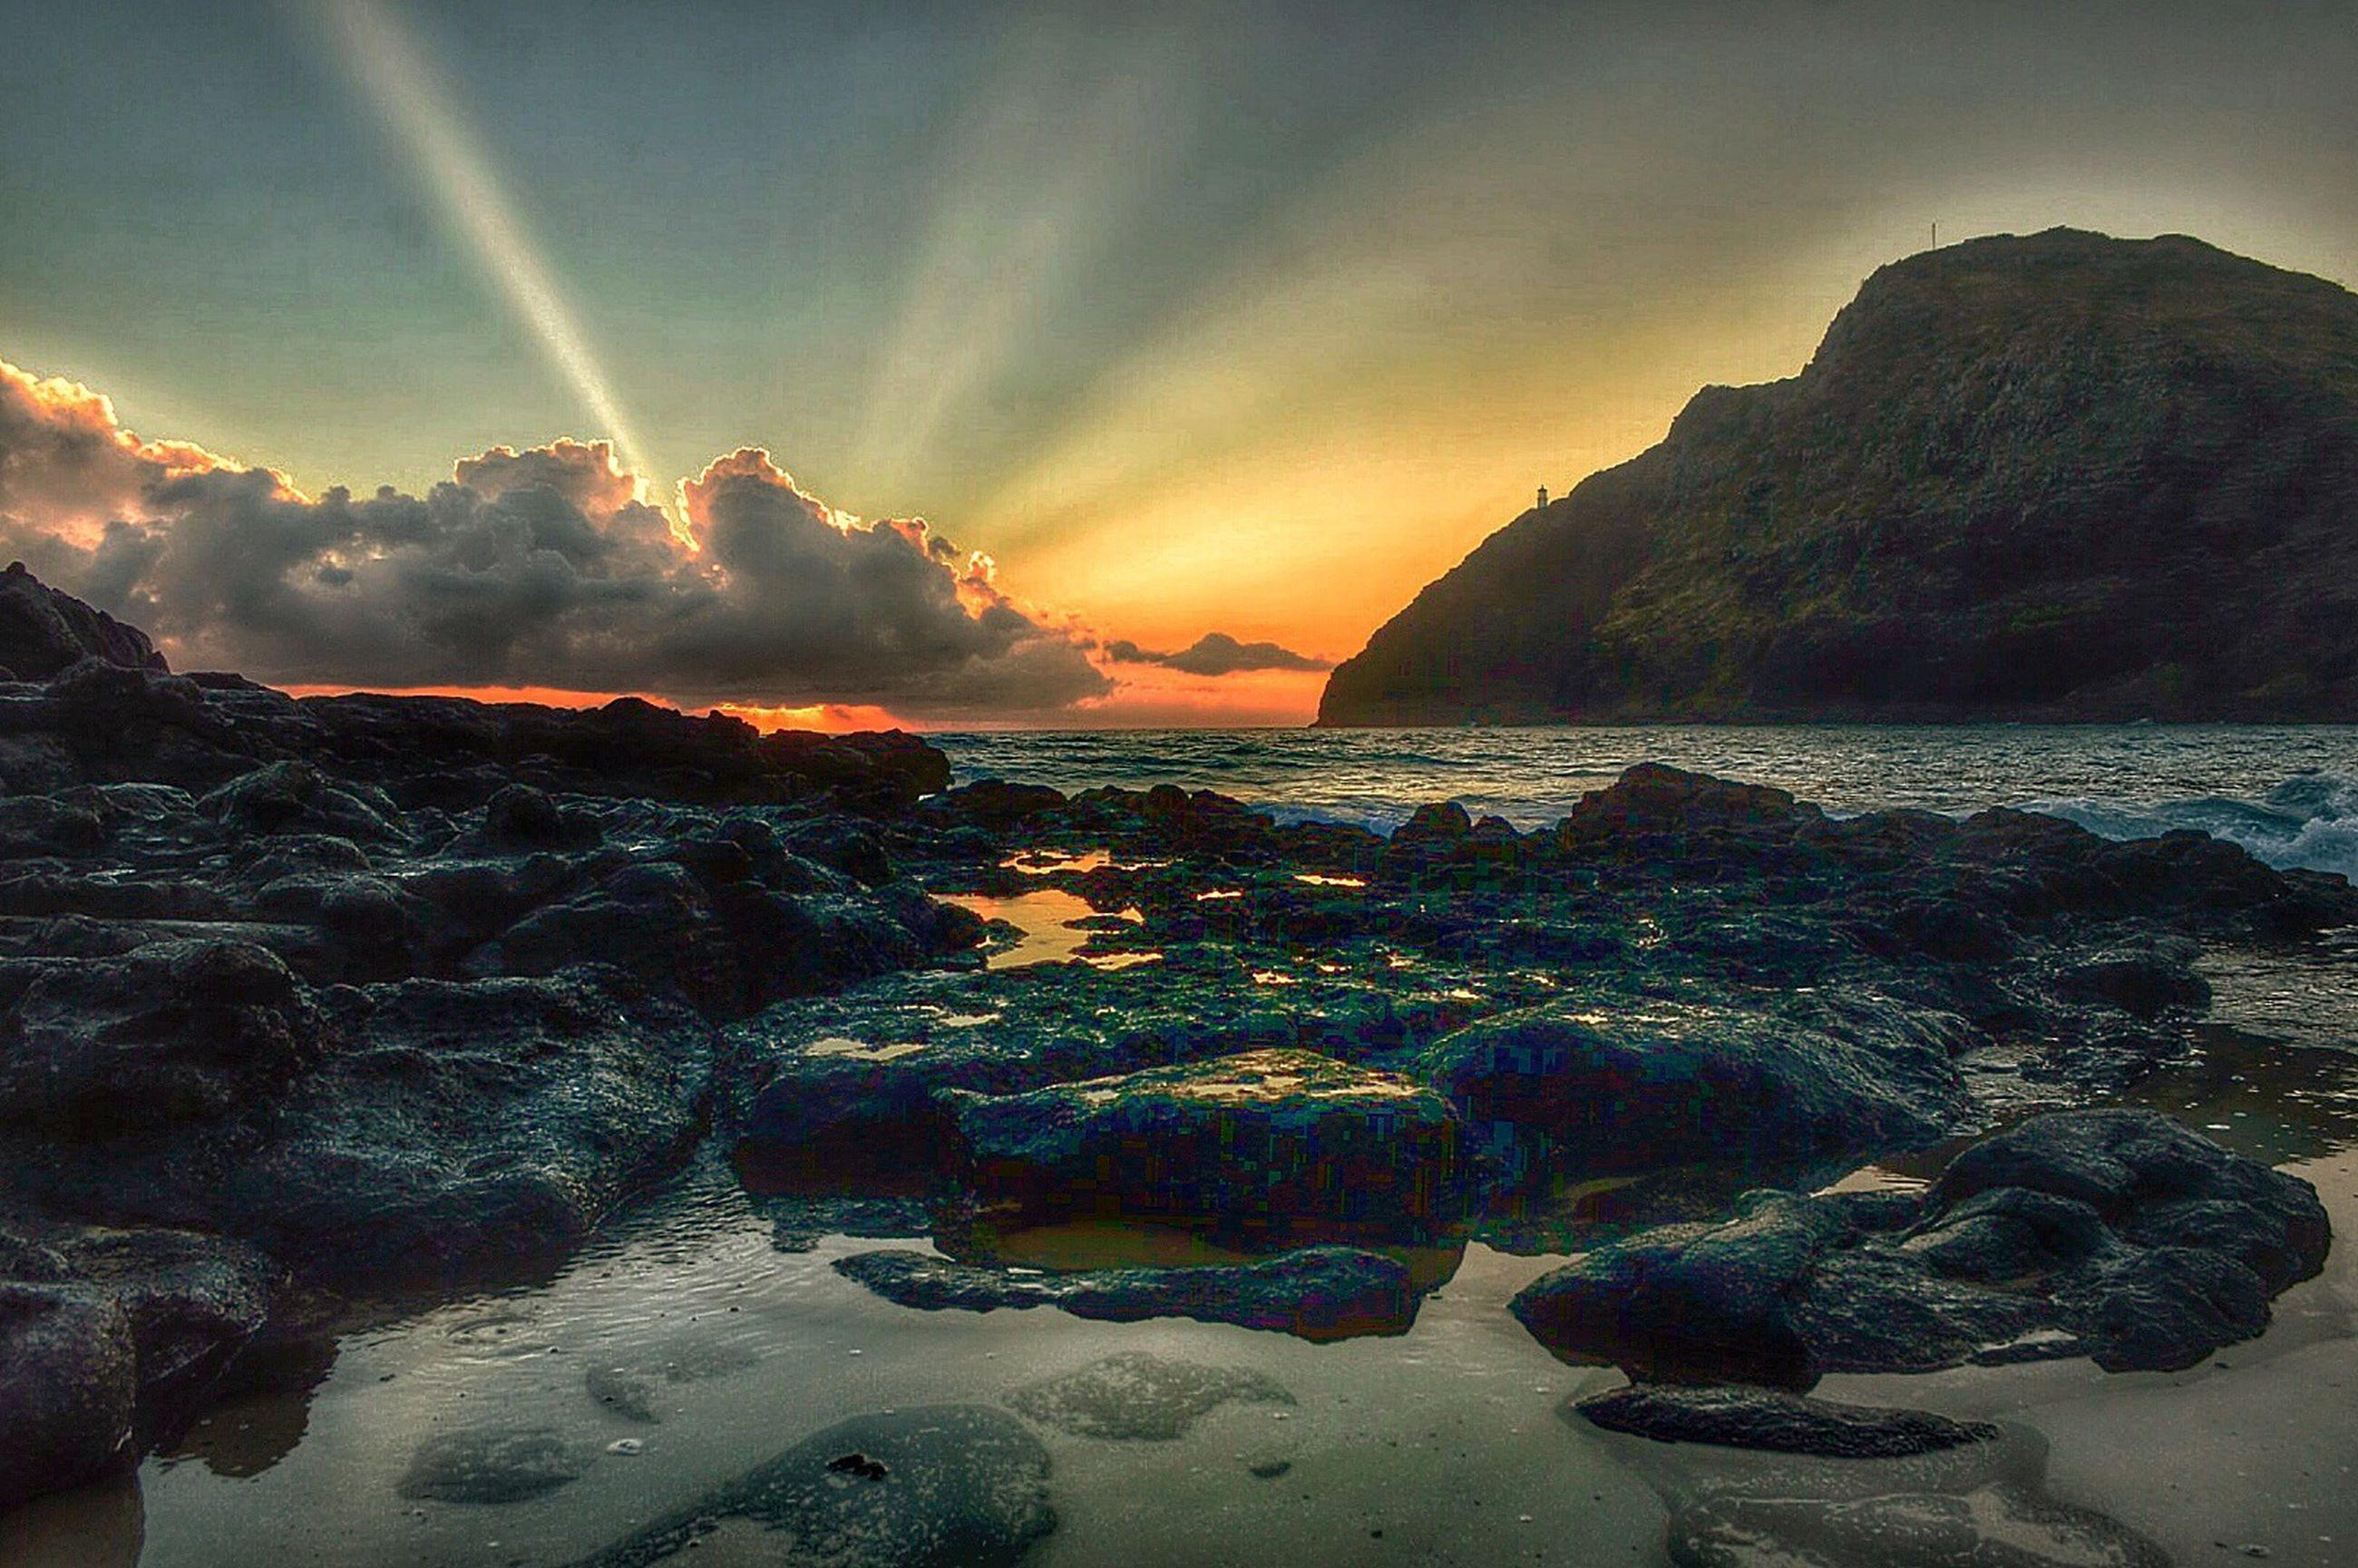 water, scenics, beauty in nature, sea, tranquil scene, sky, rock - object, sunset, tranquility, rock formation, nature, beach, mountain, idyllic, cloud - sky, shore, sun, sunbeam, sunlight, rock